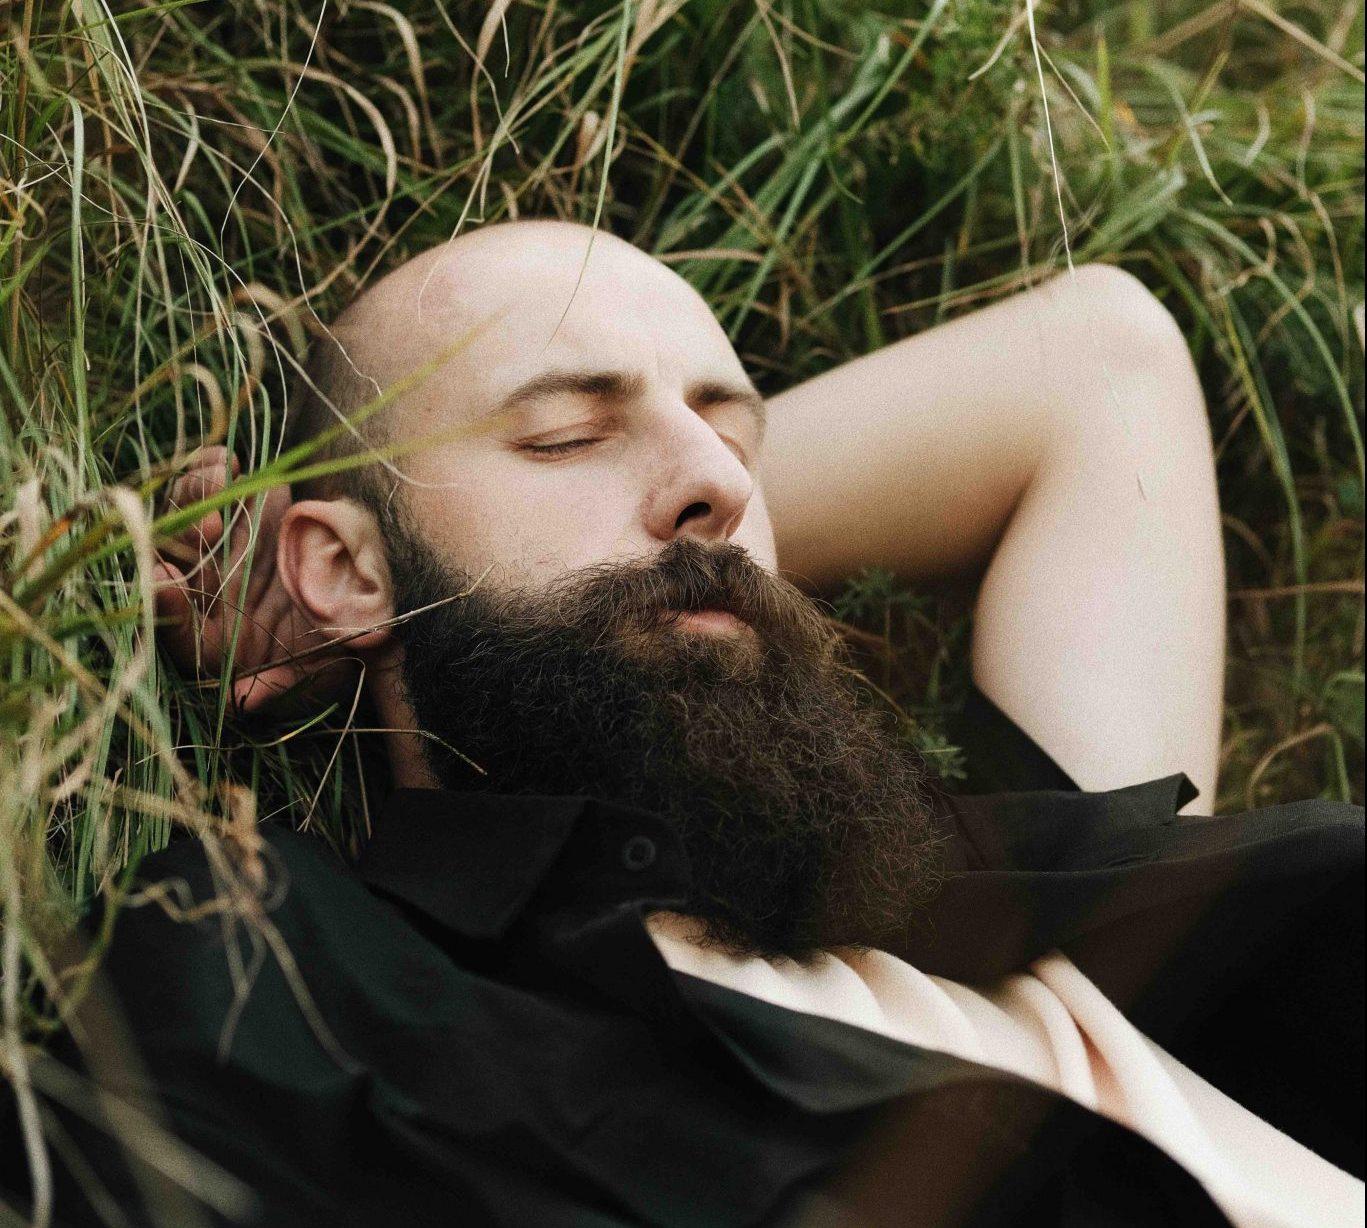 funny beard facts - modern man loves beards